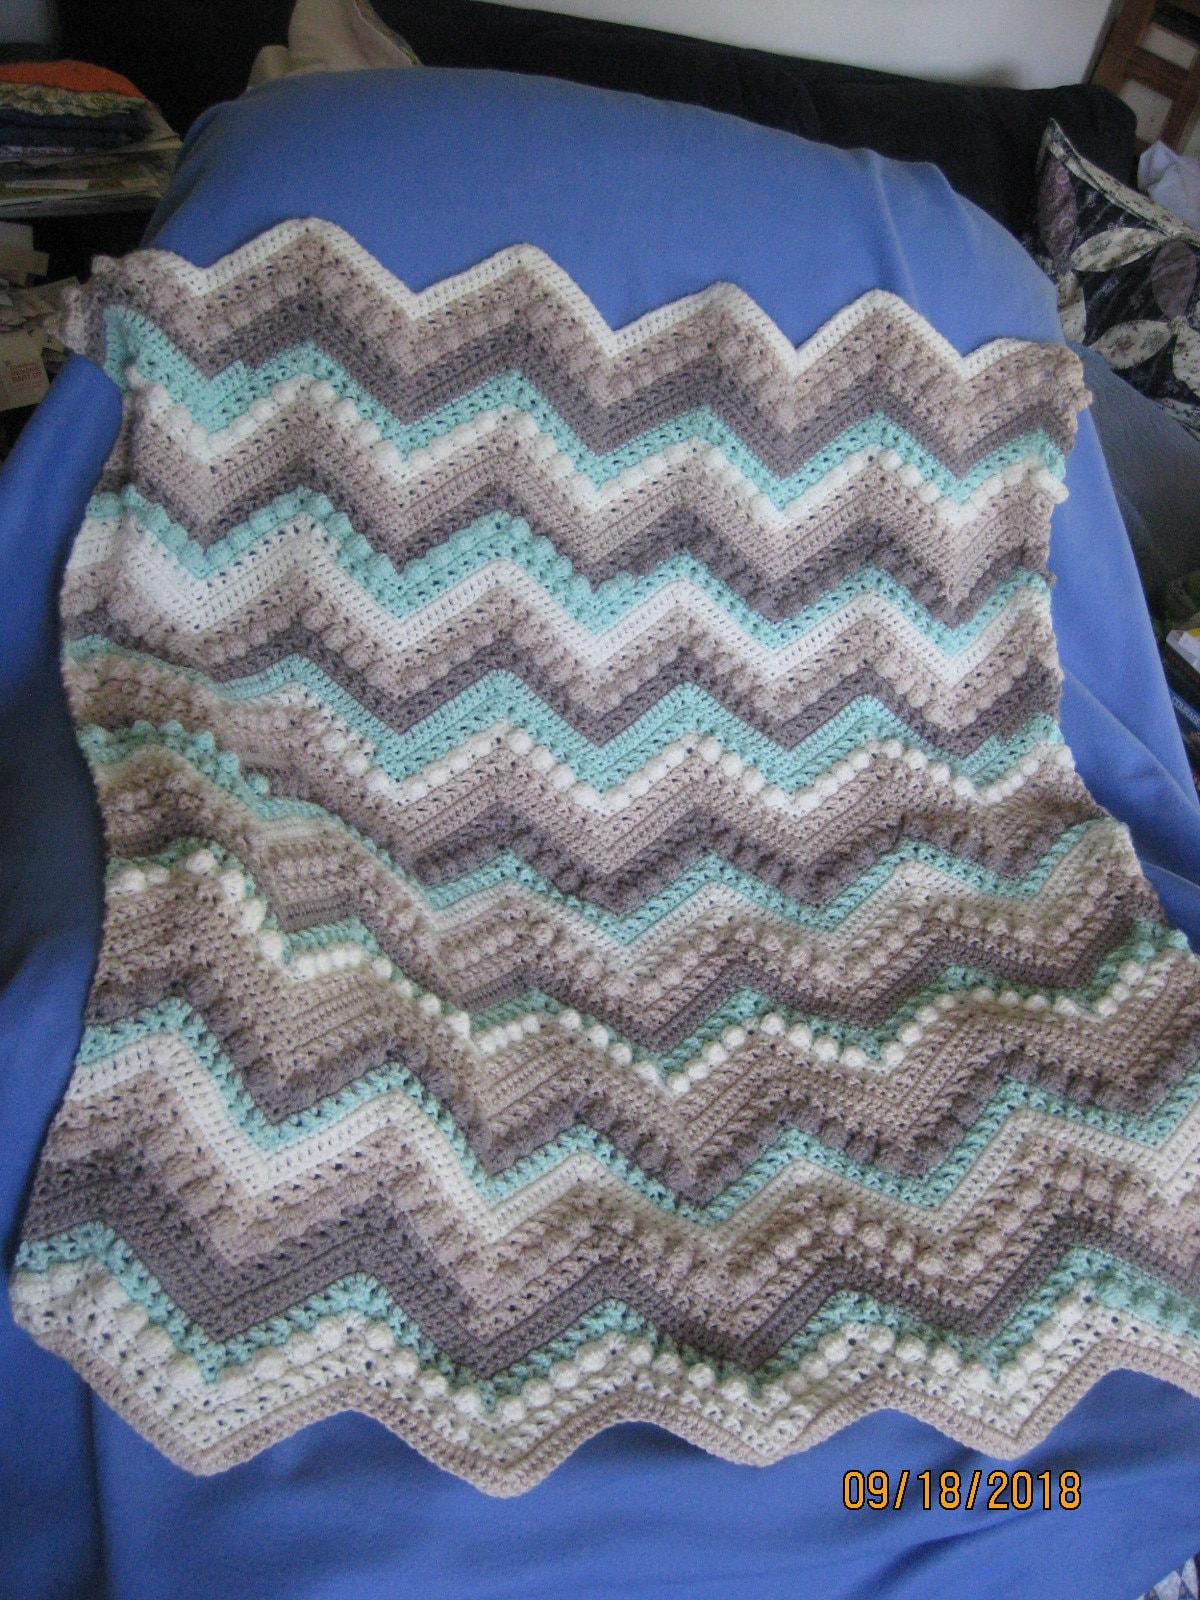 Handmade Crocheted Baby Blanket Hugs And Kisses In Dreamy Etsy